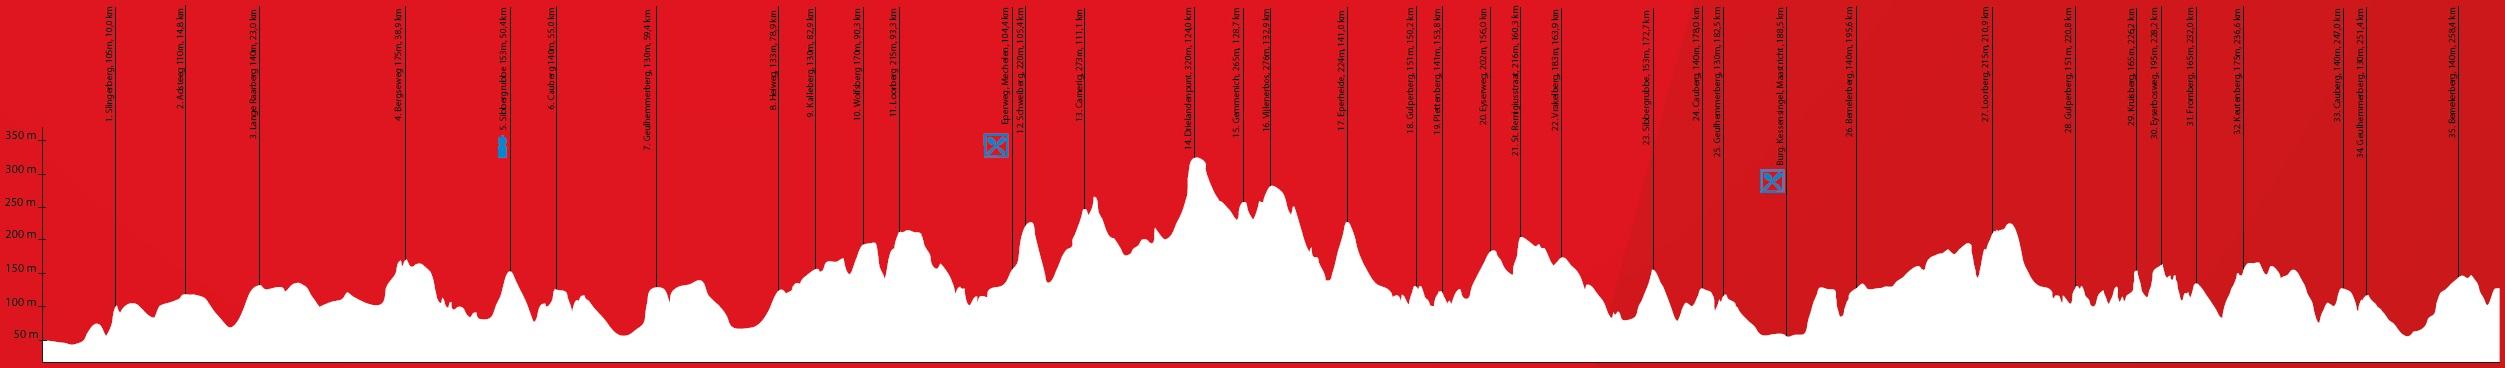 Van der Poel Amstel Gold Race